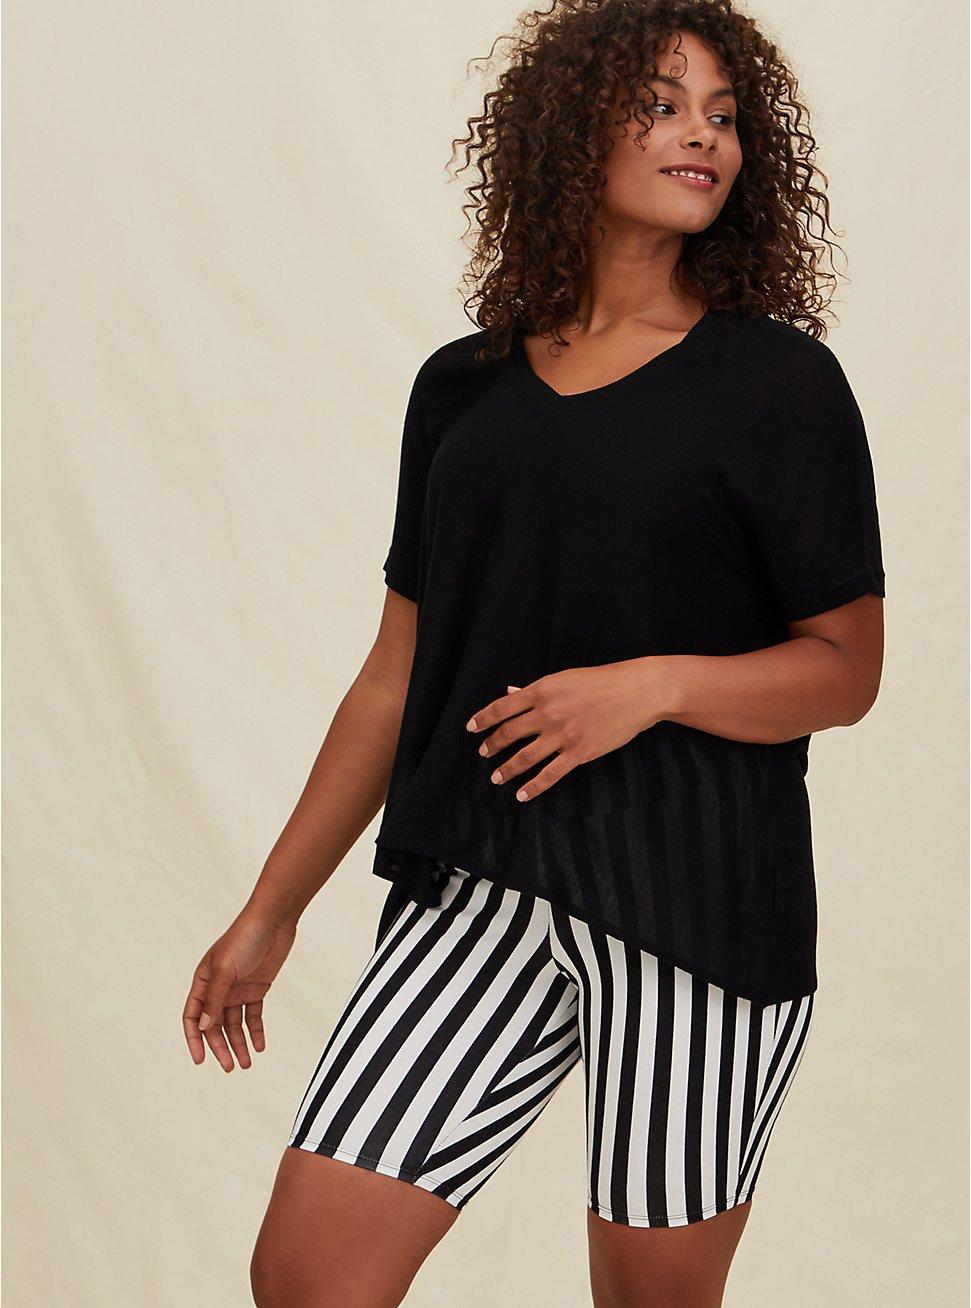 Black Sweater Knit Dolman Pullover Top, DEEP BLACK, hi-res